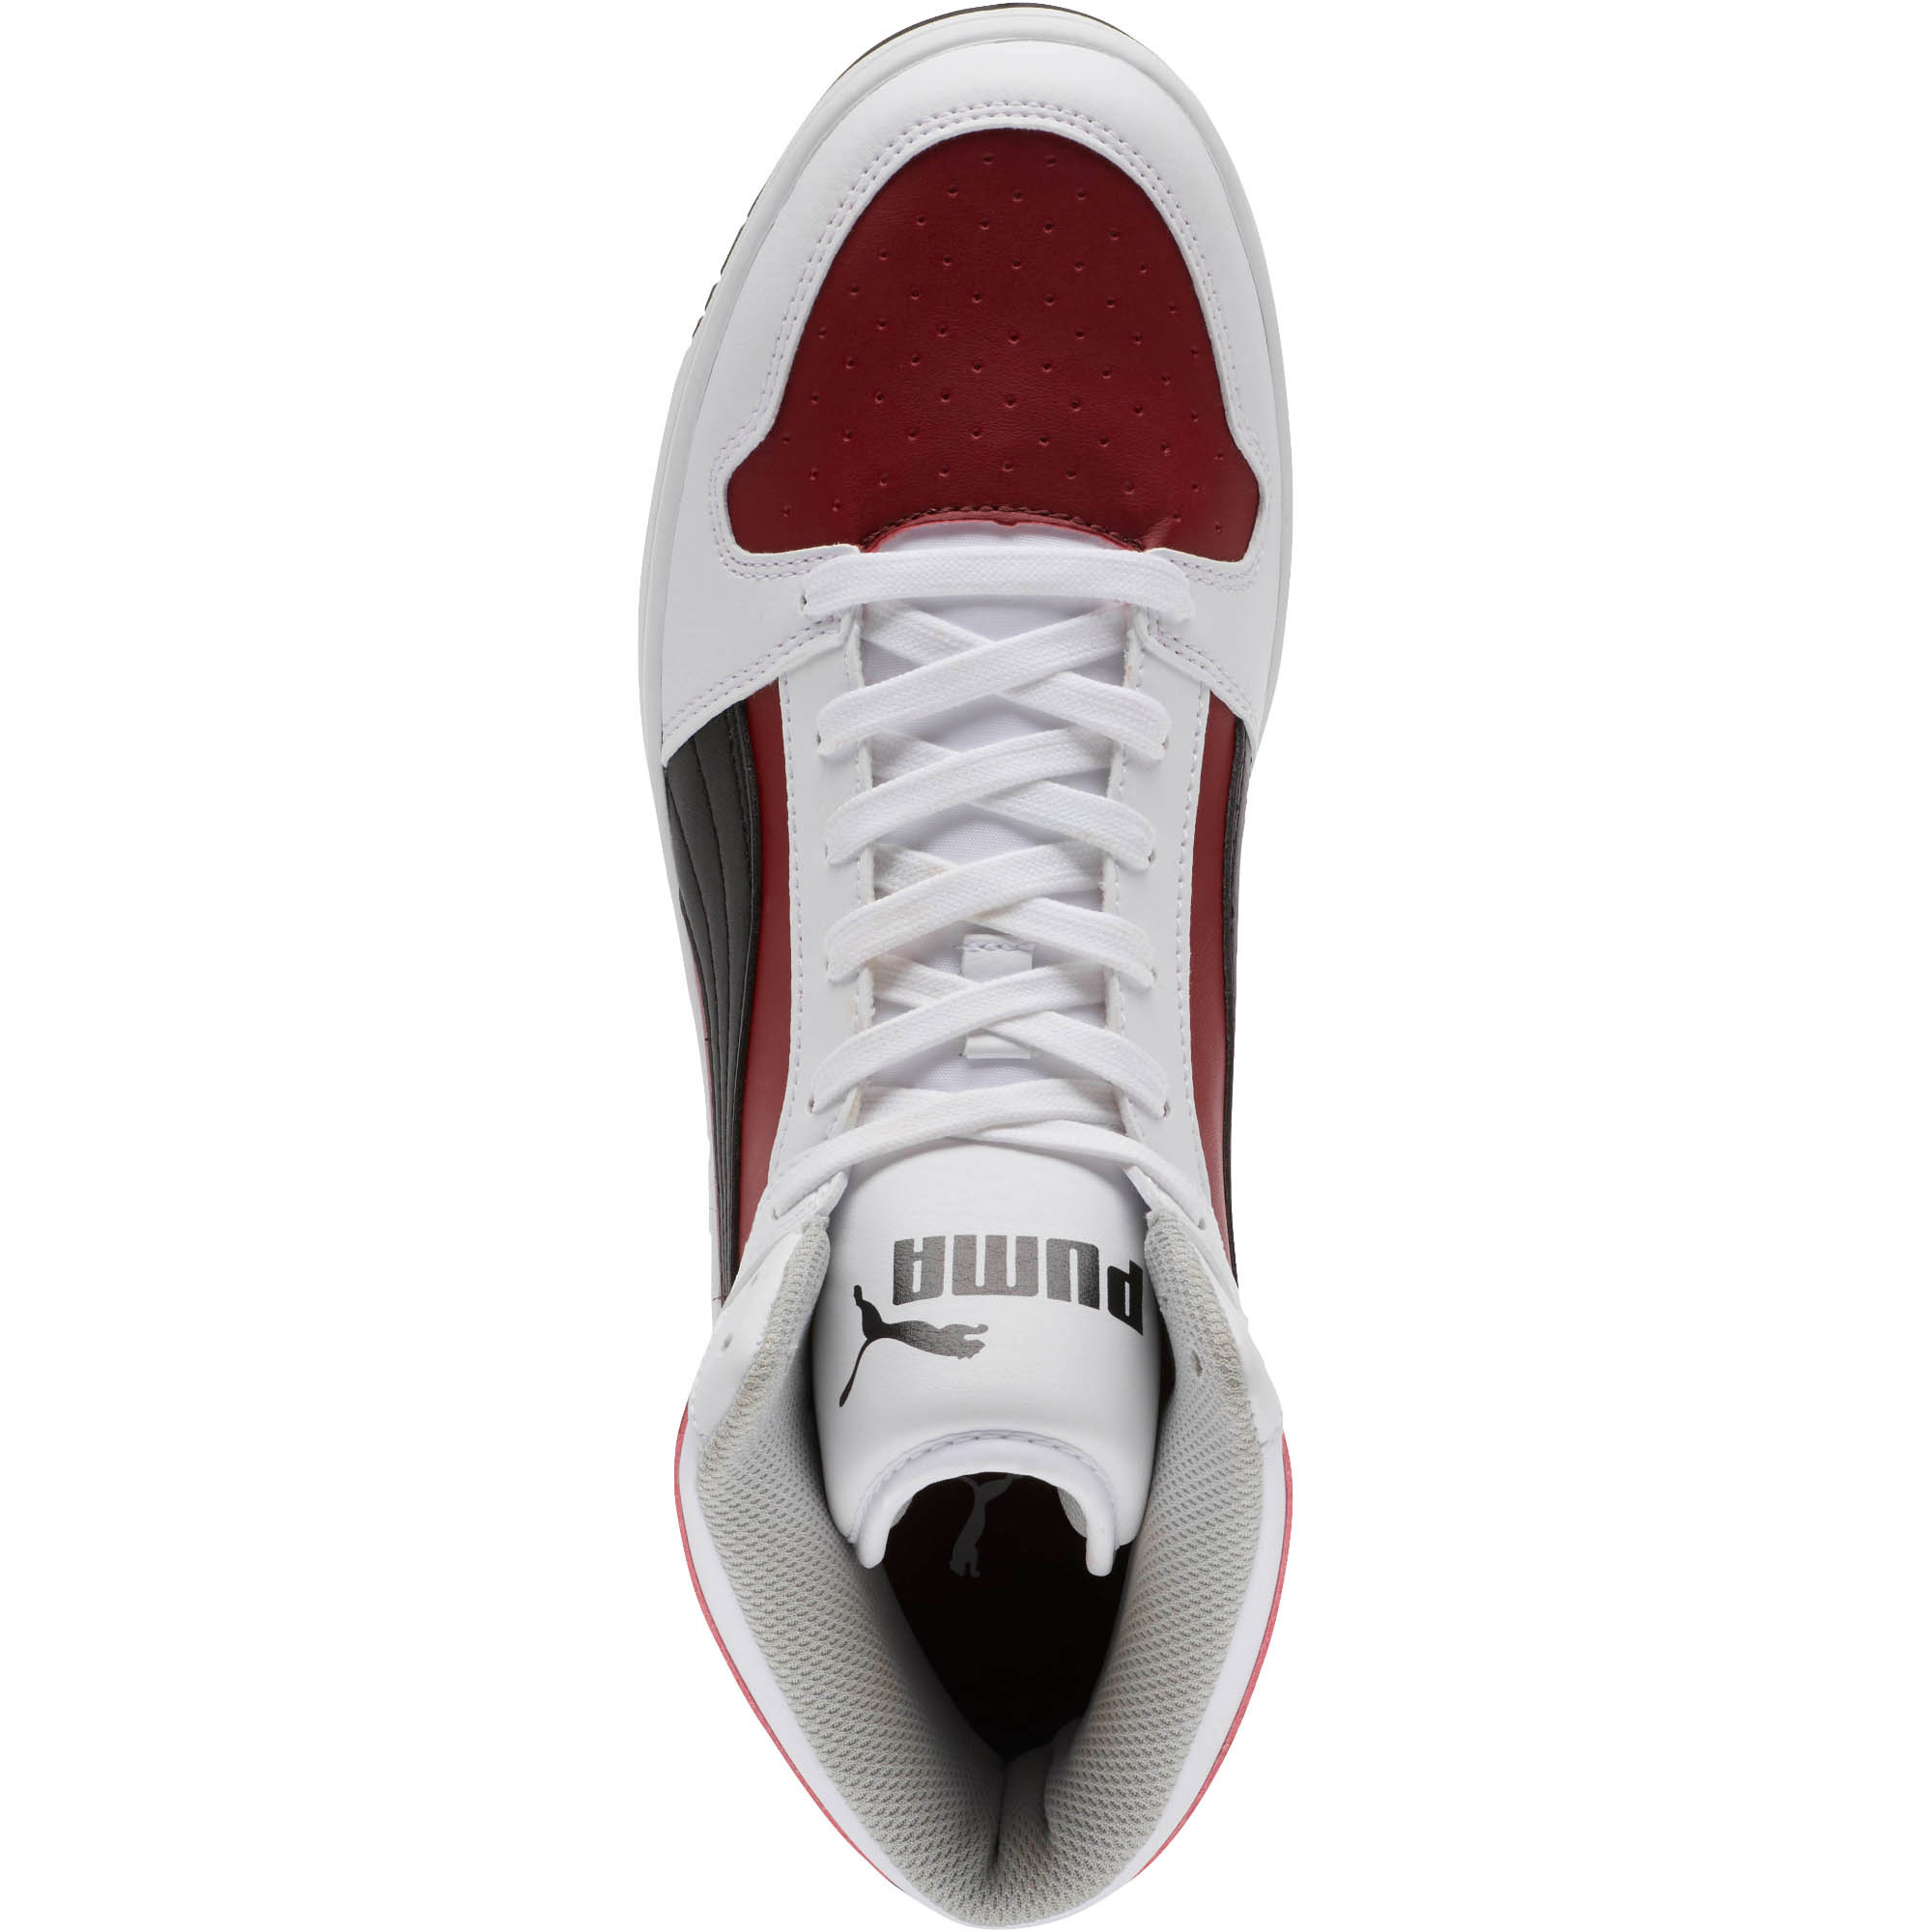 PUMA-PUMA-Rebound-LayUp-Men-039-s-Sneakers-Men-Mid-Boot-Basics thumbnail 11